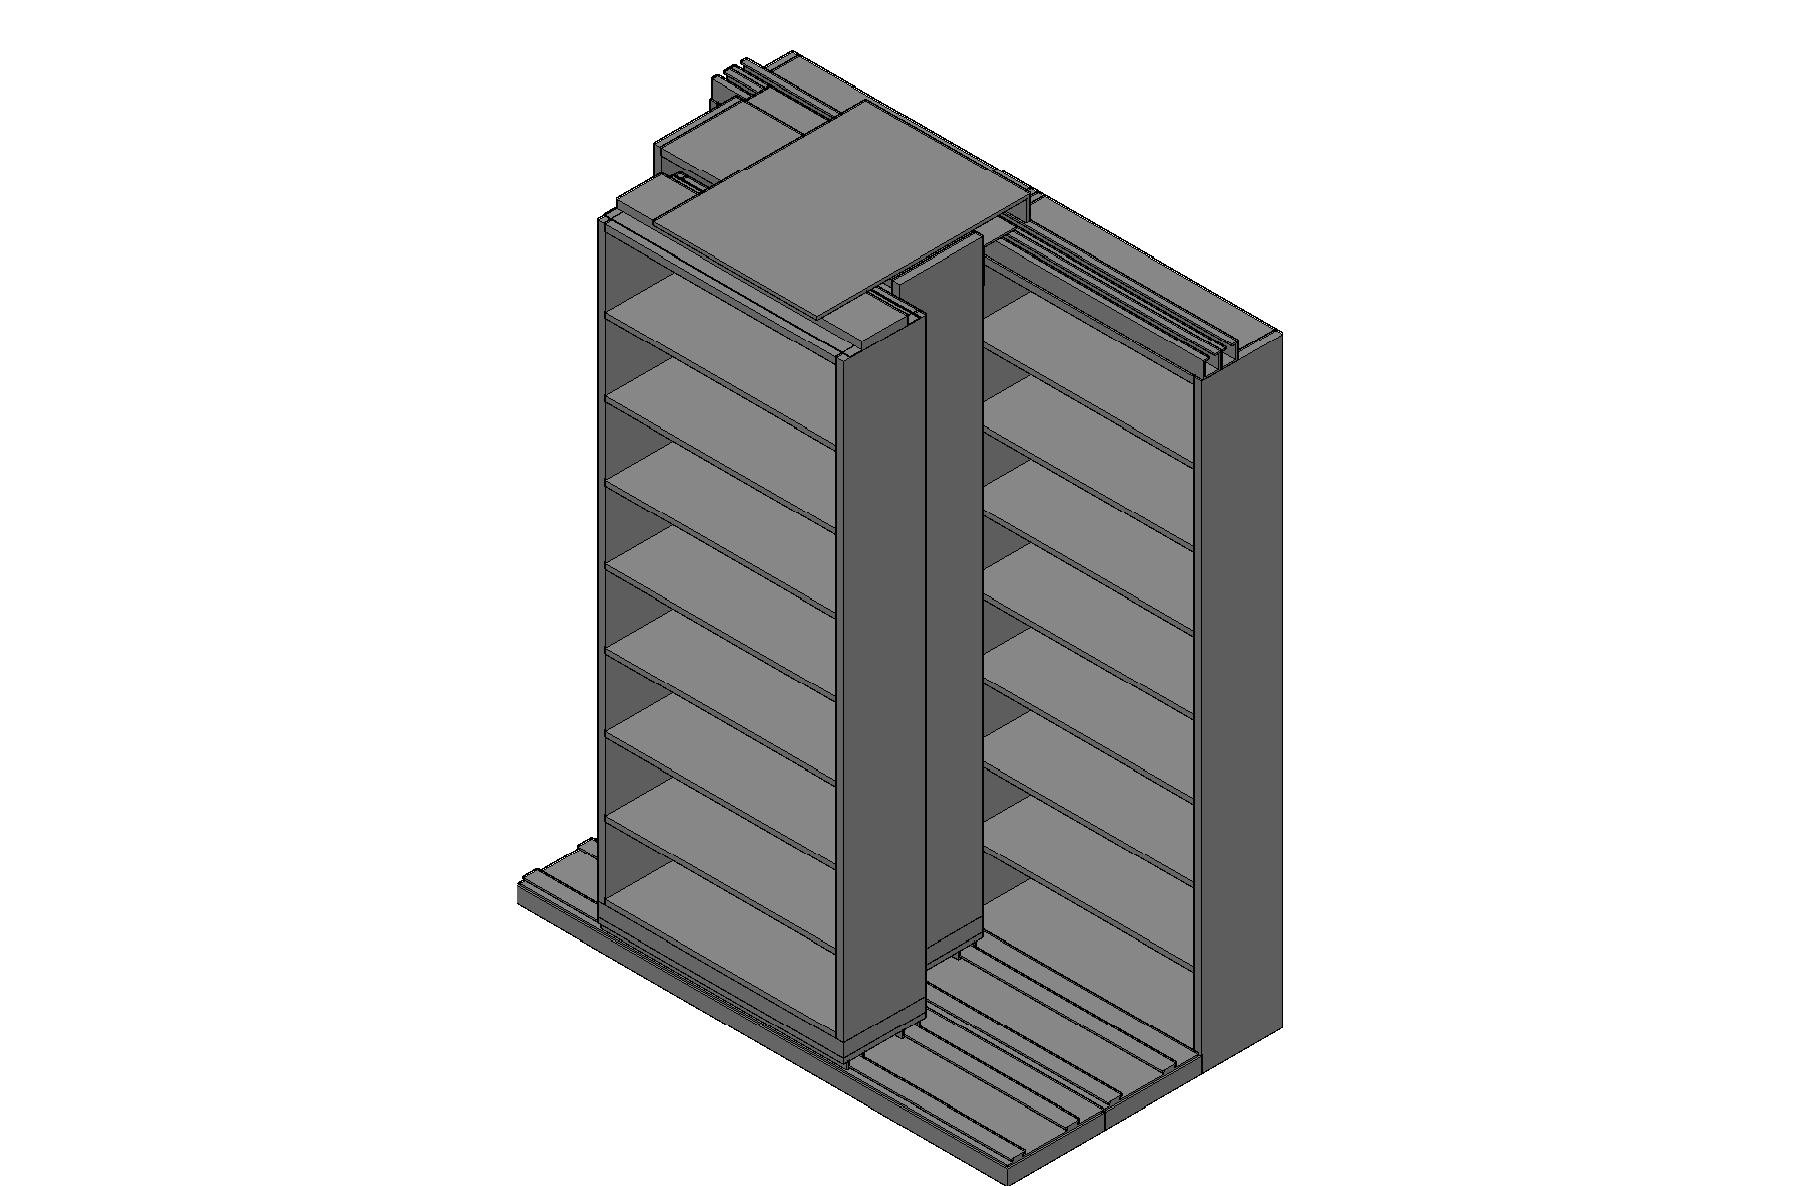 "Letter Size Sliding Shelves - 3 Rows Deep - 8 Levels - (36"" x 12"" Shelves) - 76"" Total Width"